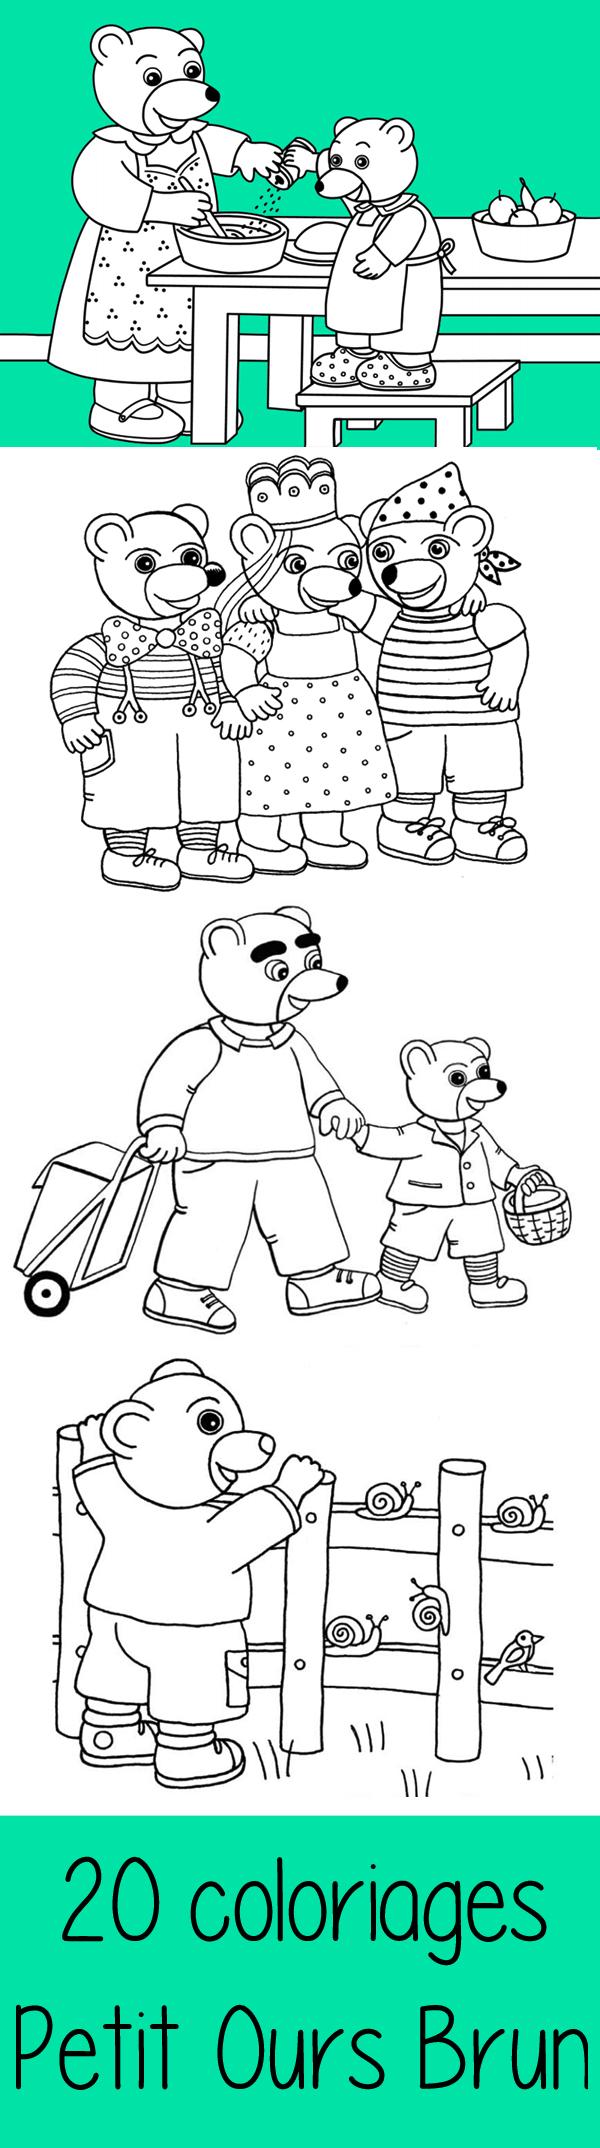 diaporama: 20 coloriages Petit Ours Brun | Petit ours brun, Ours brun et Coloriage enfant